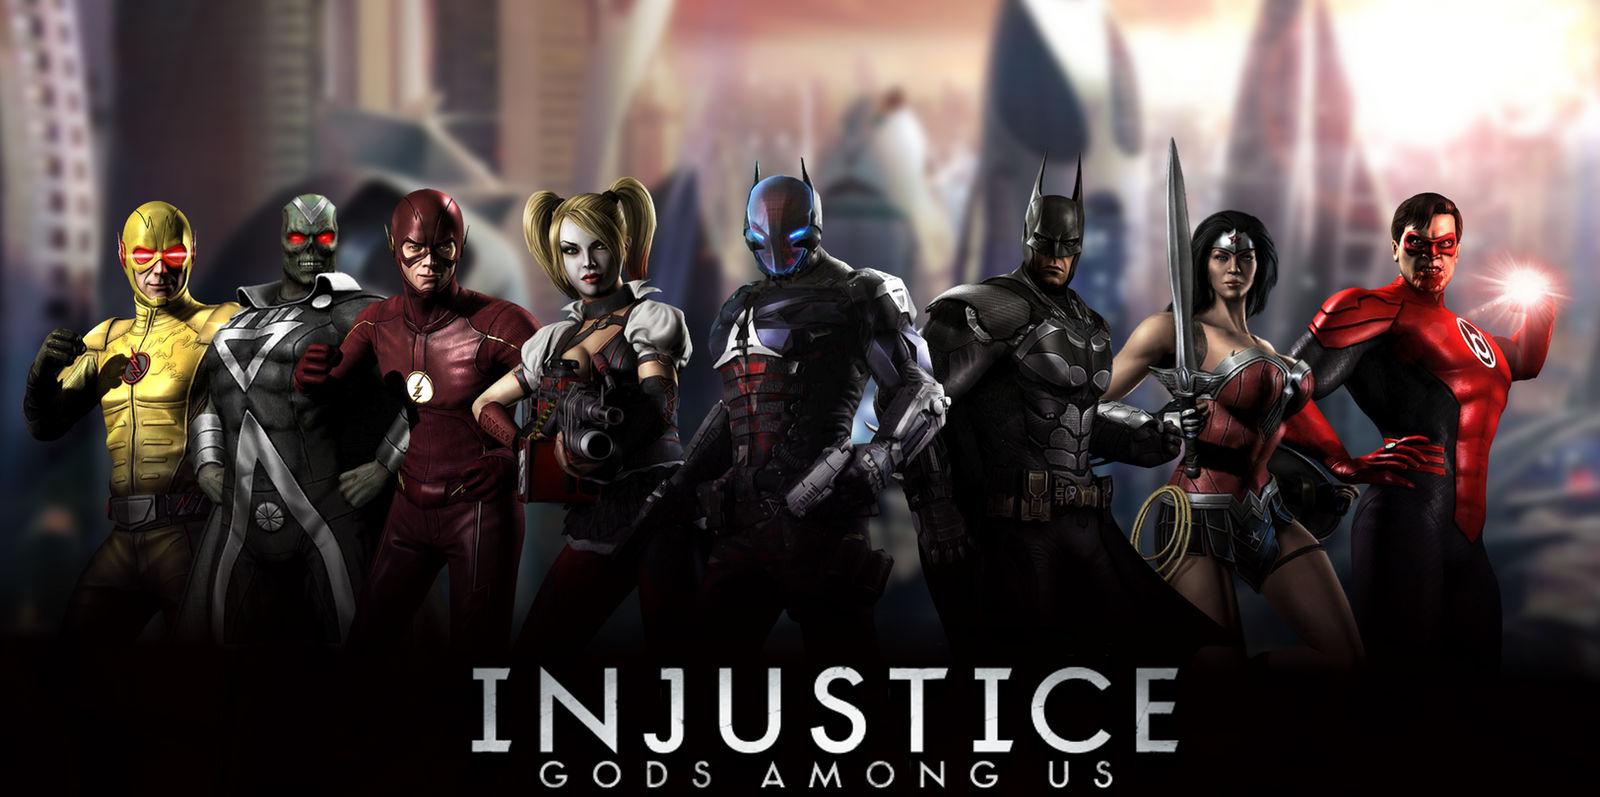 Injustice Gods Among Us Wallpaper By Arkhamnatic On Deviantart